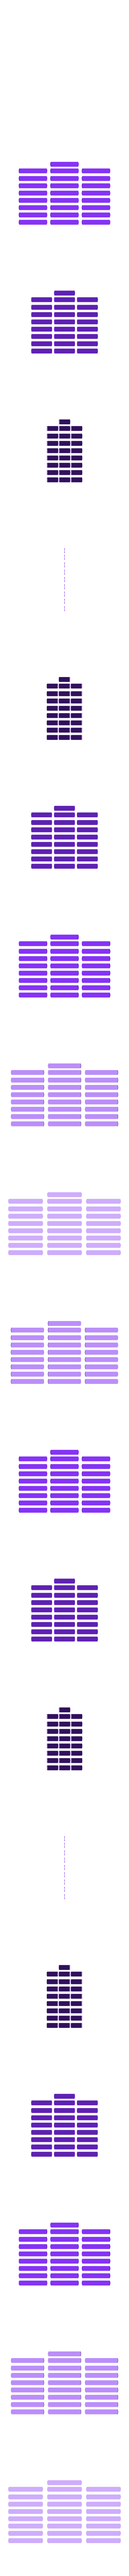 IntrigeBasis.stl Download free STL file Name Labels / Tags for Dominion Card Cases (German) (Namenschilder Deutsch) • 3D print model, plokr